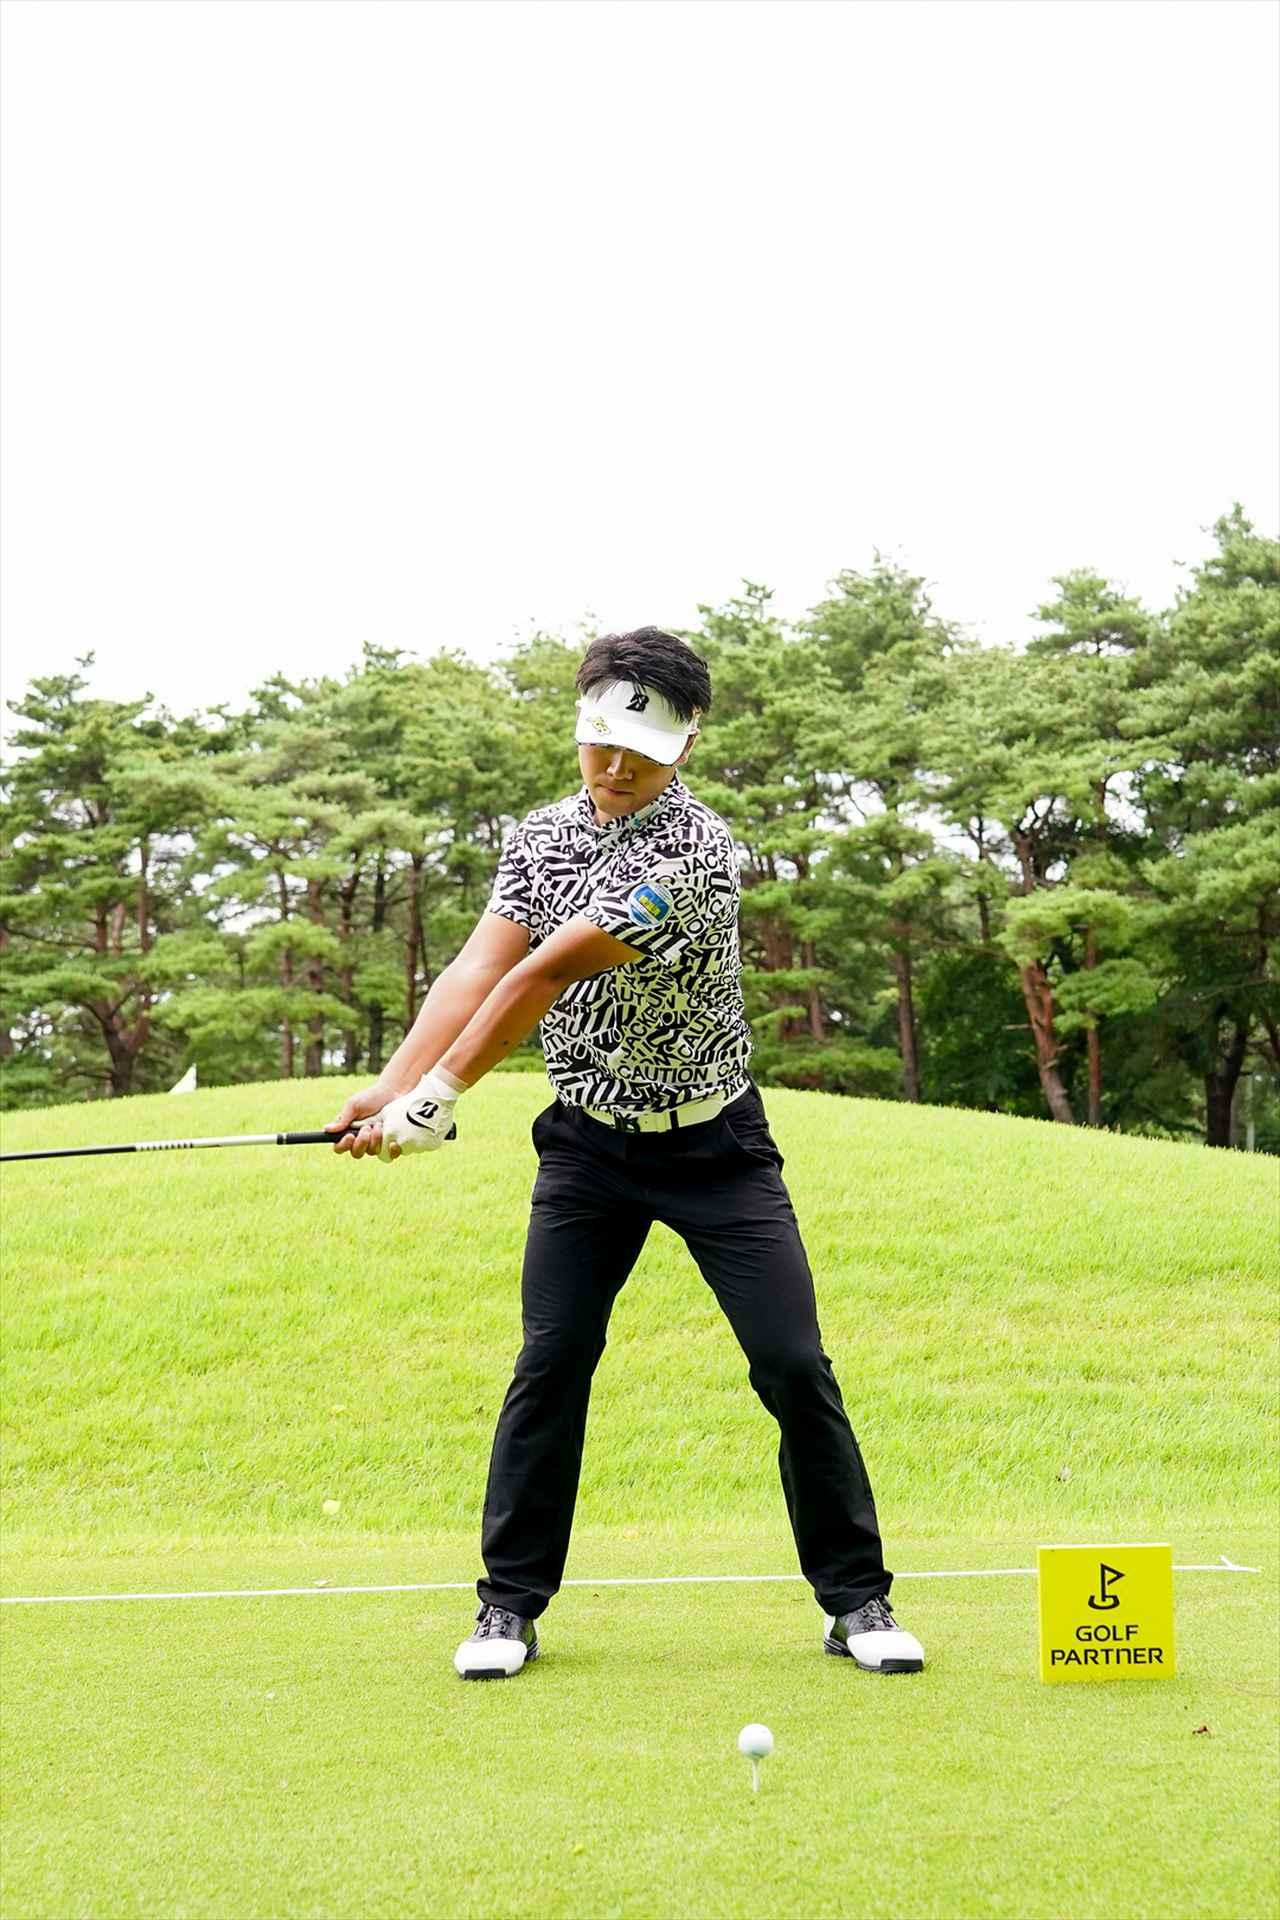 Images : 2番目の画像 - 関藤直煕 ドライバー正面連続写真 - みんなのゴルフダイジェスト